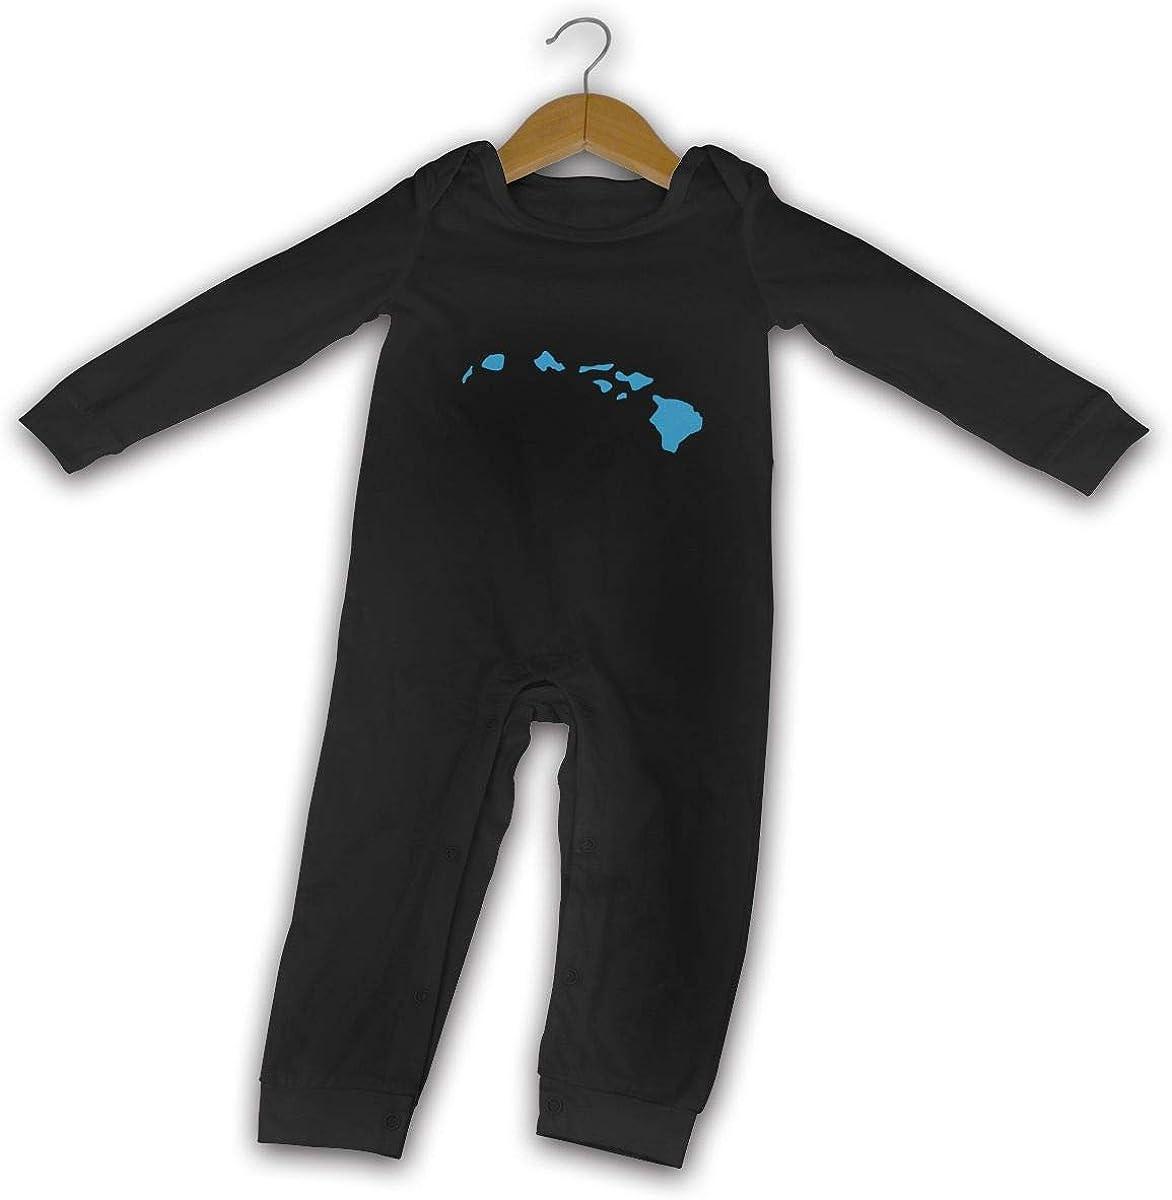 Hawaii Hi /& Map I Love Printed Baby Jumpsuit Long Sleeve Outfits Black